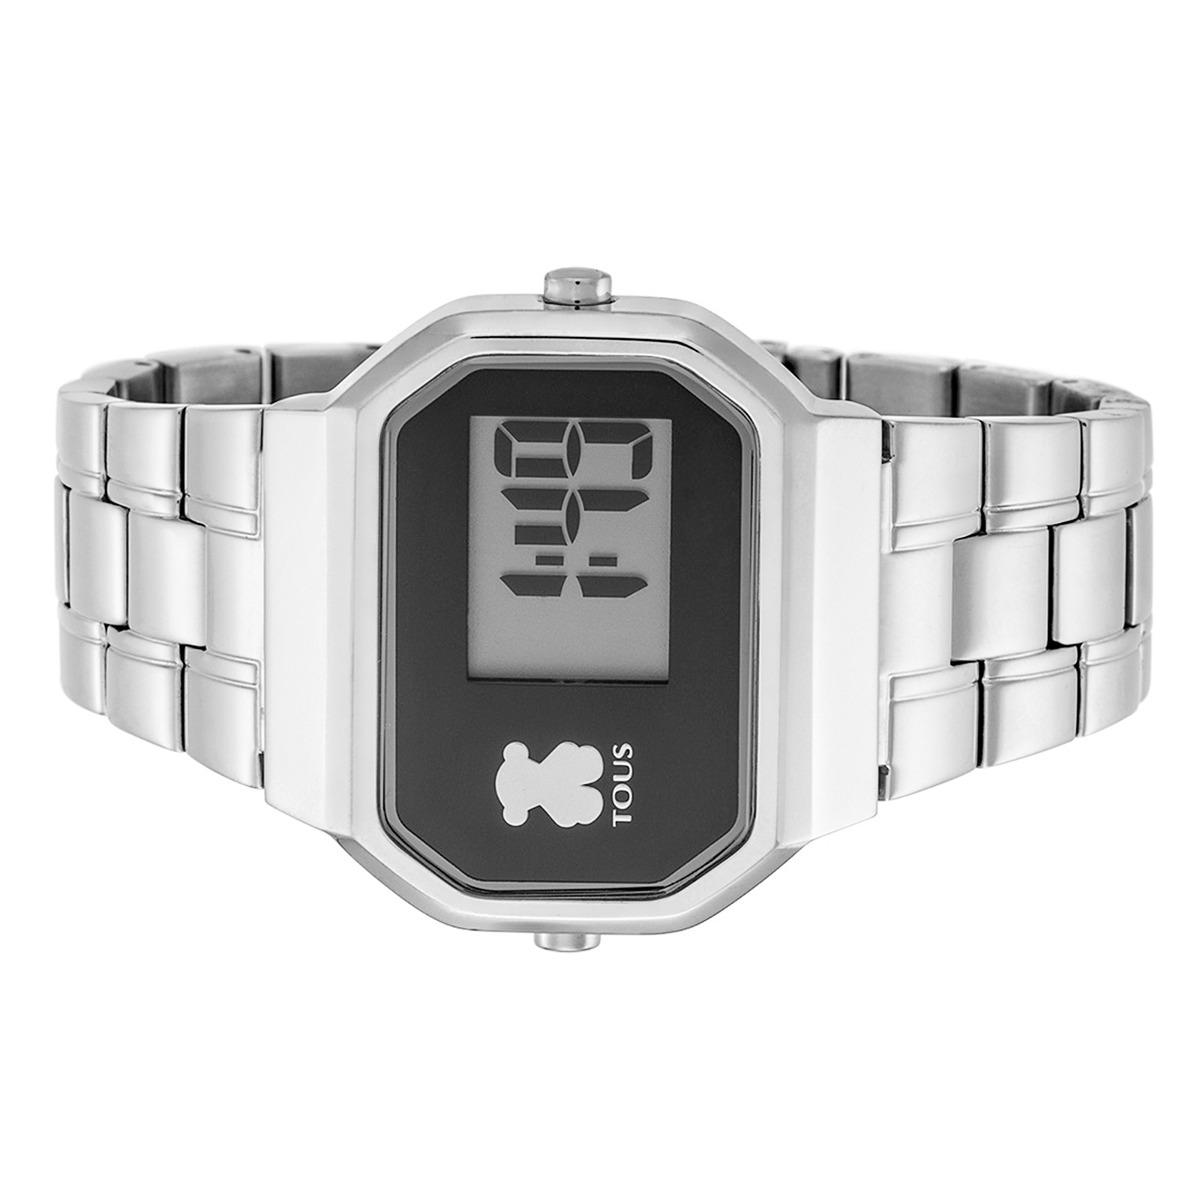 3bc0541677 Reloj Tous 600350295 Acero Inoxidable Plateado Mujer - $ 399.900 en ...